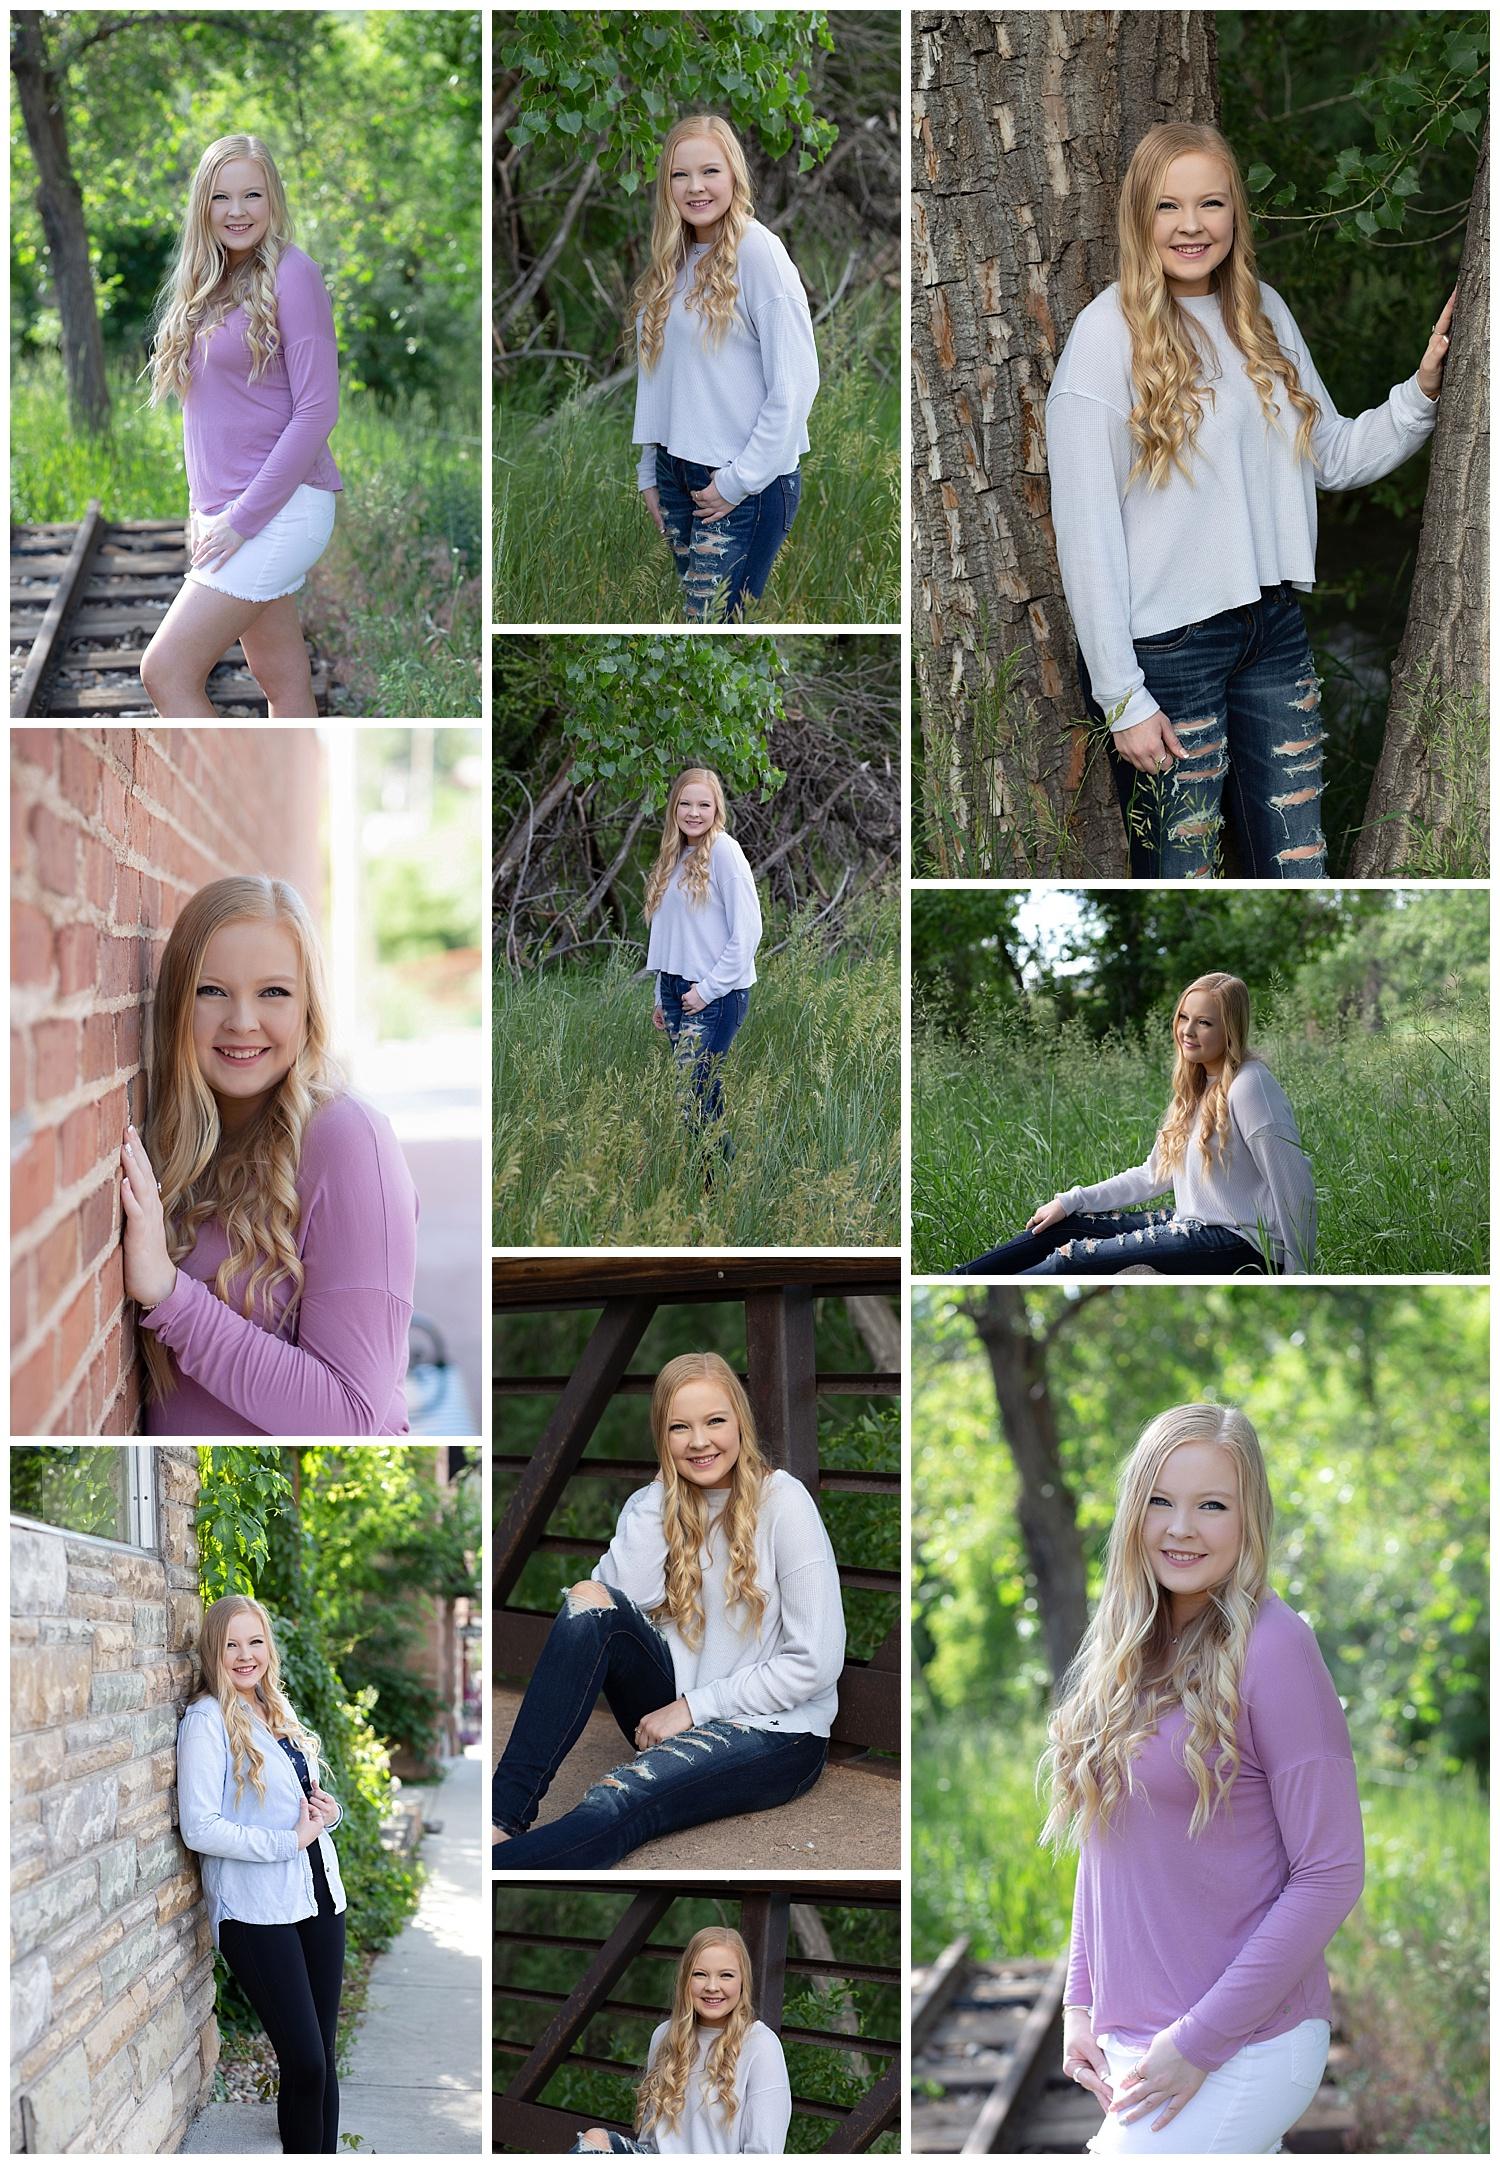 Nichole had her high school senior photos taken on June 29, 2019 with her best friend Kate!